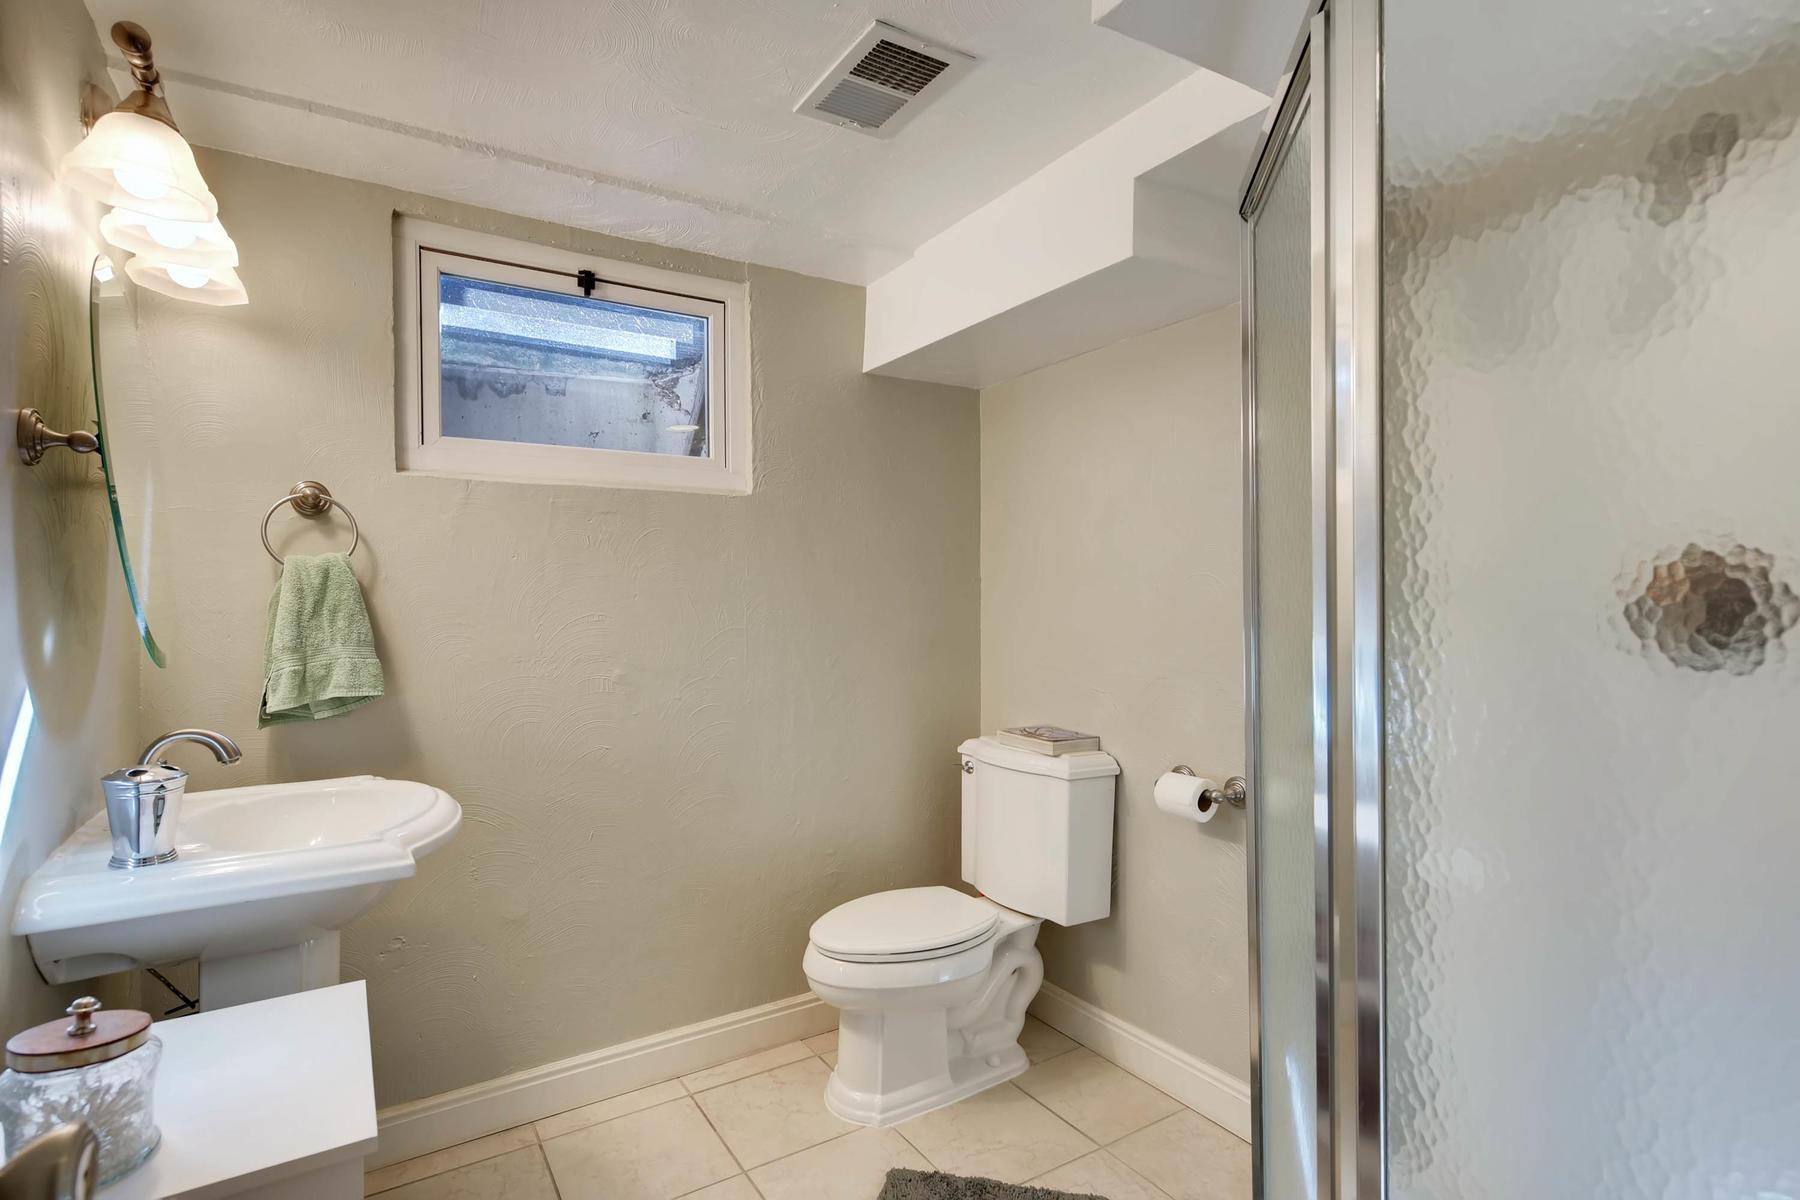 6676 S Kit Carson St-MLS_Size-023-14-Lower Level Bathroom-1800x1200-72dpi.jpg